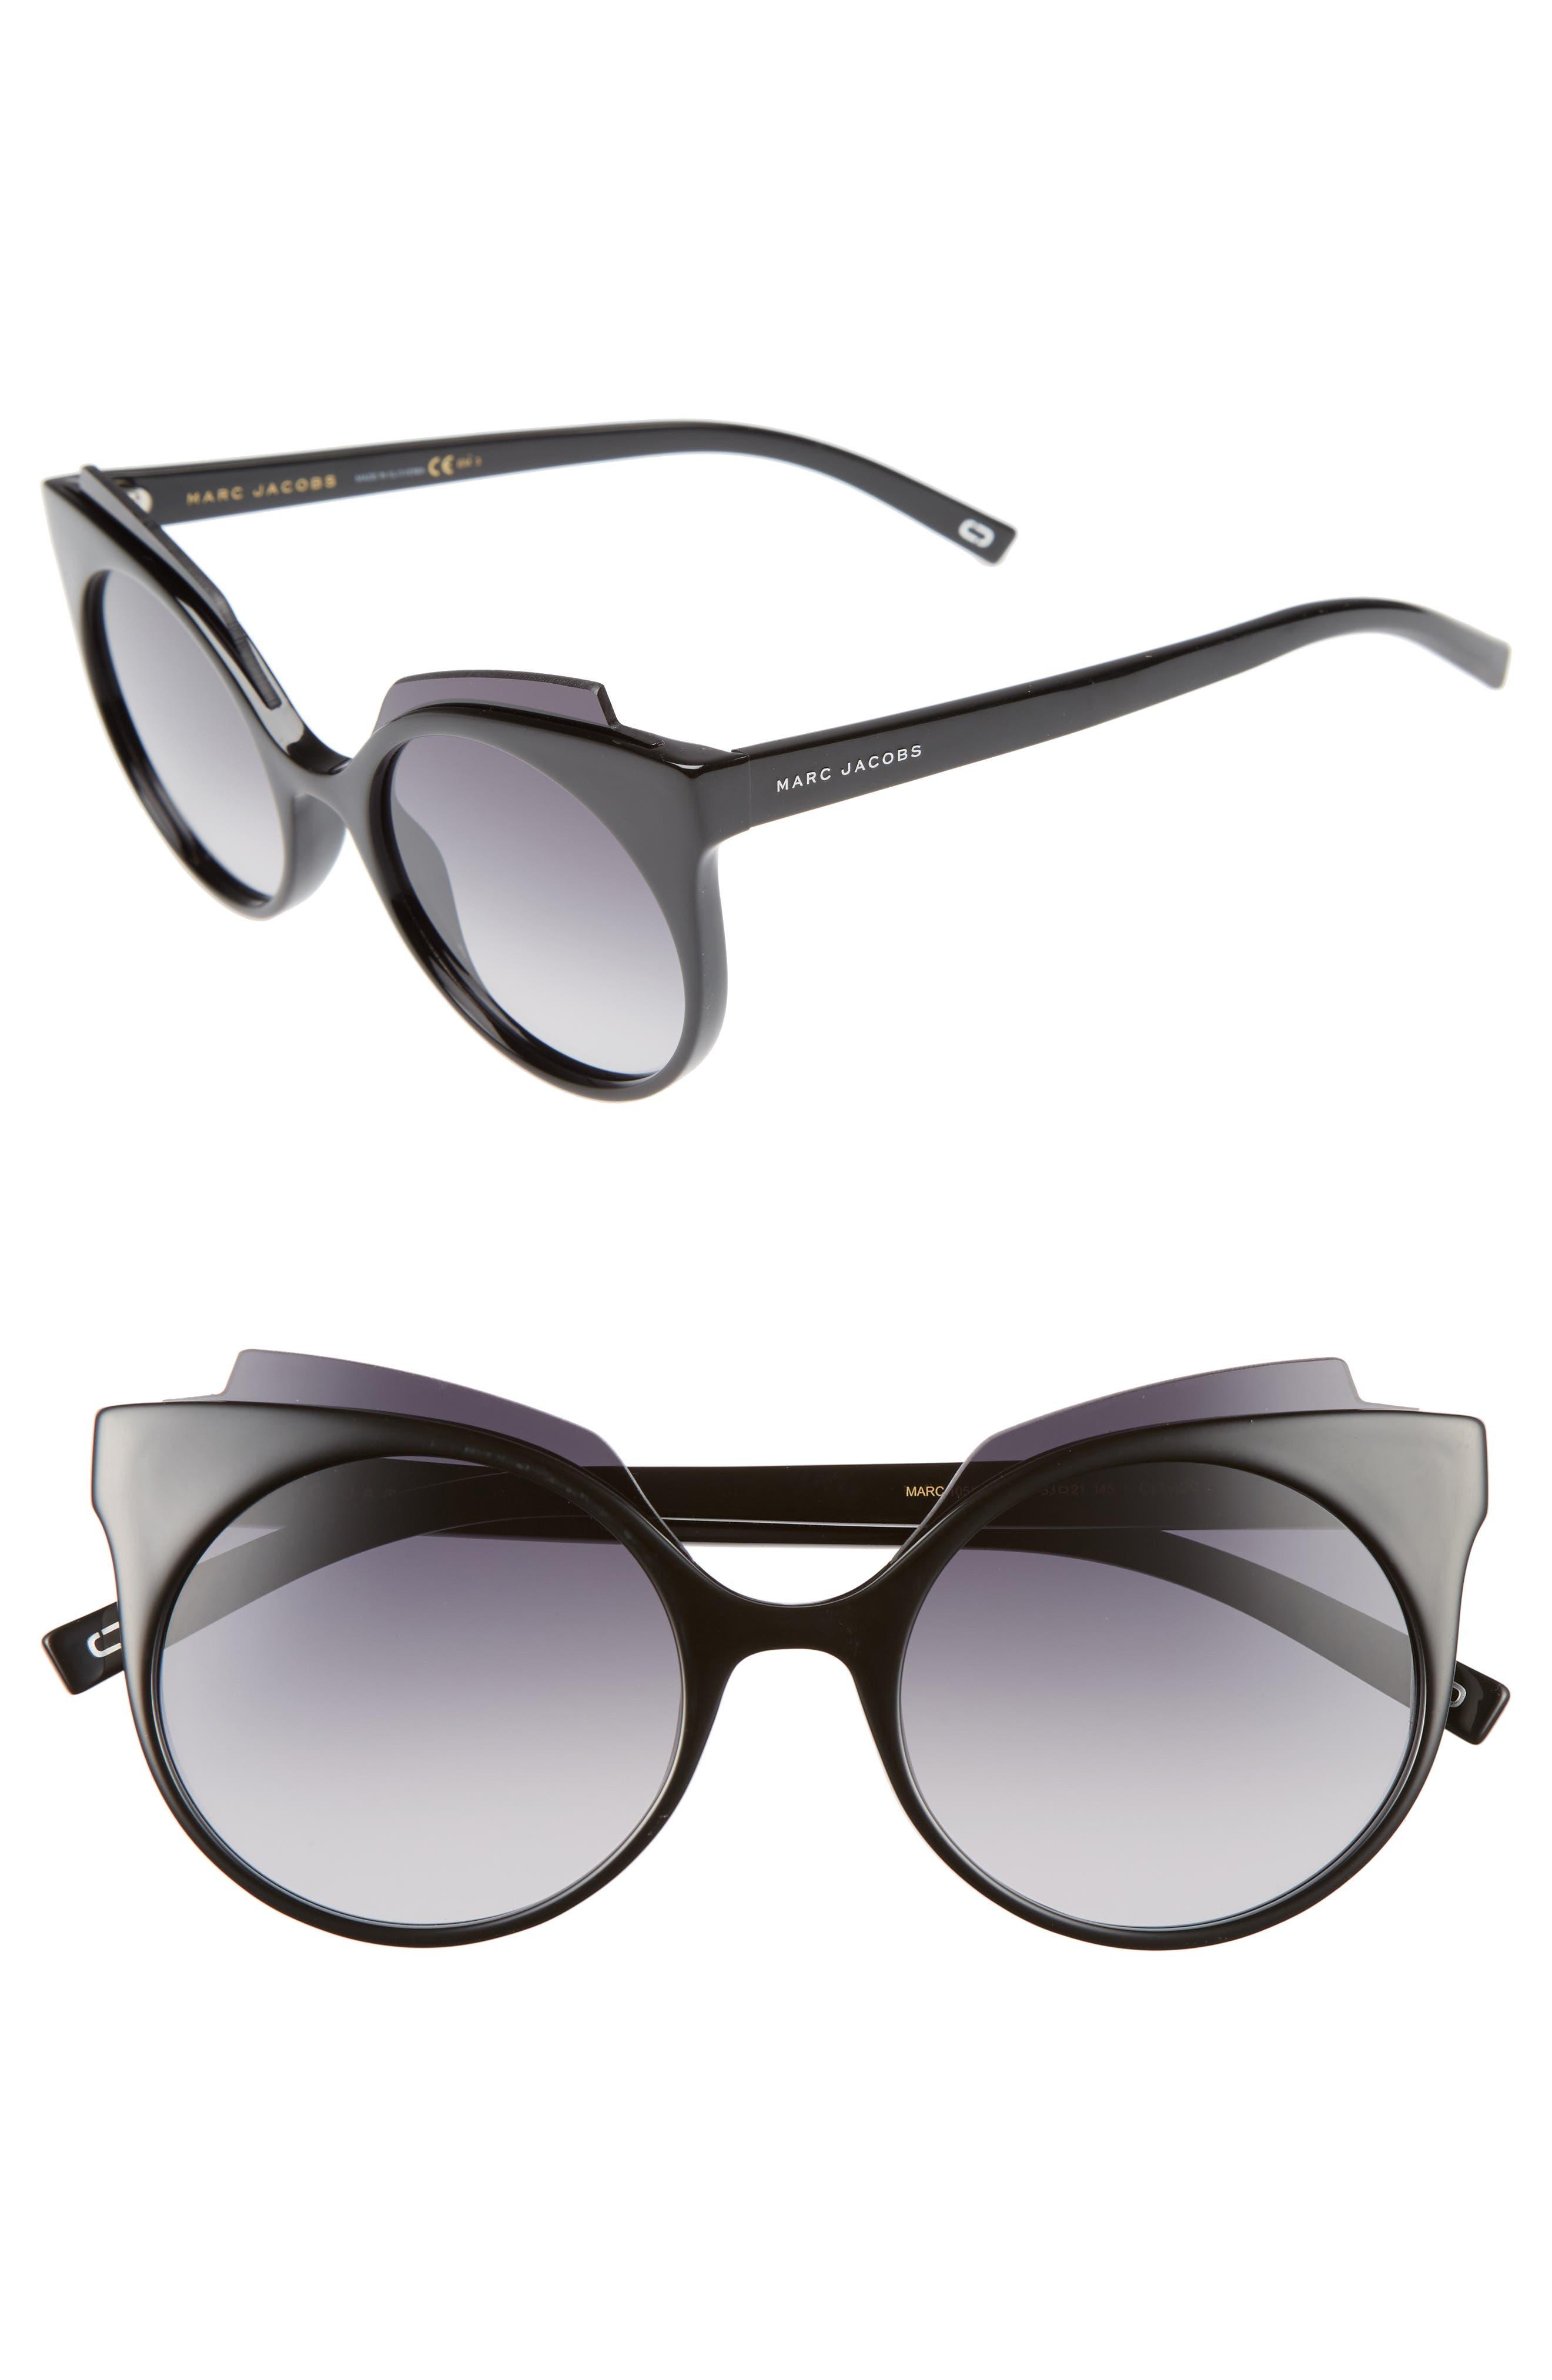 53mm Oversized Sunglasses,                             Alternate thumbnail 2, color,                             001